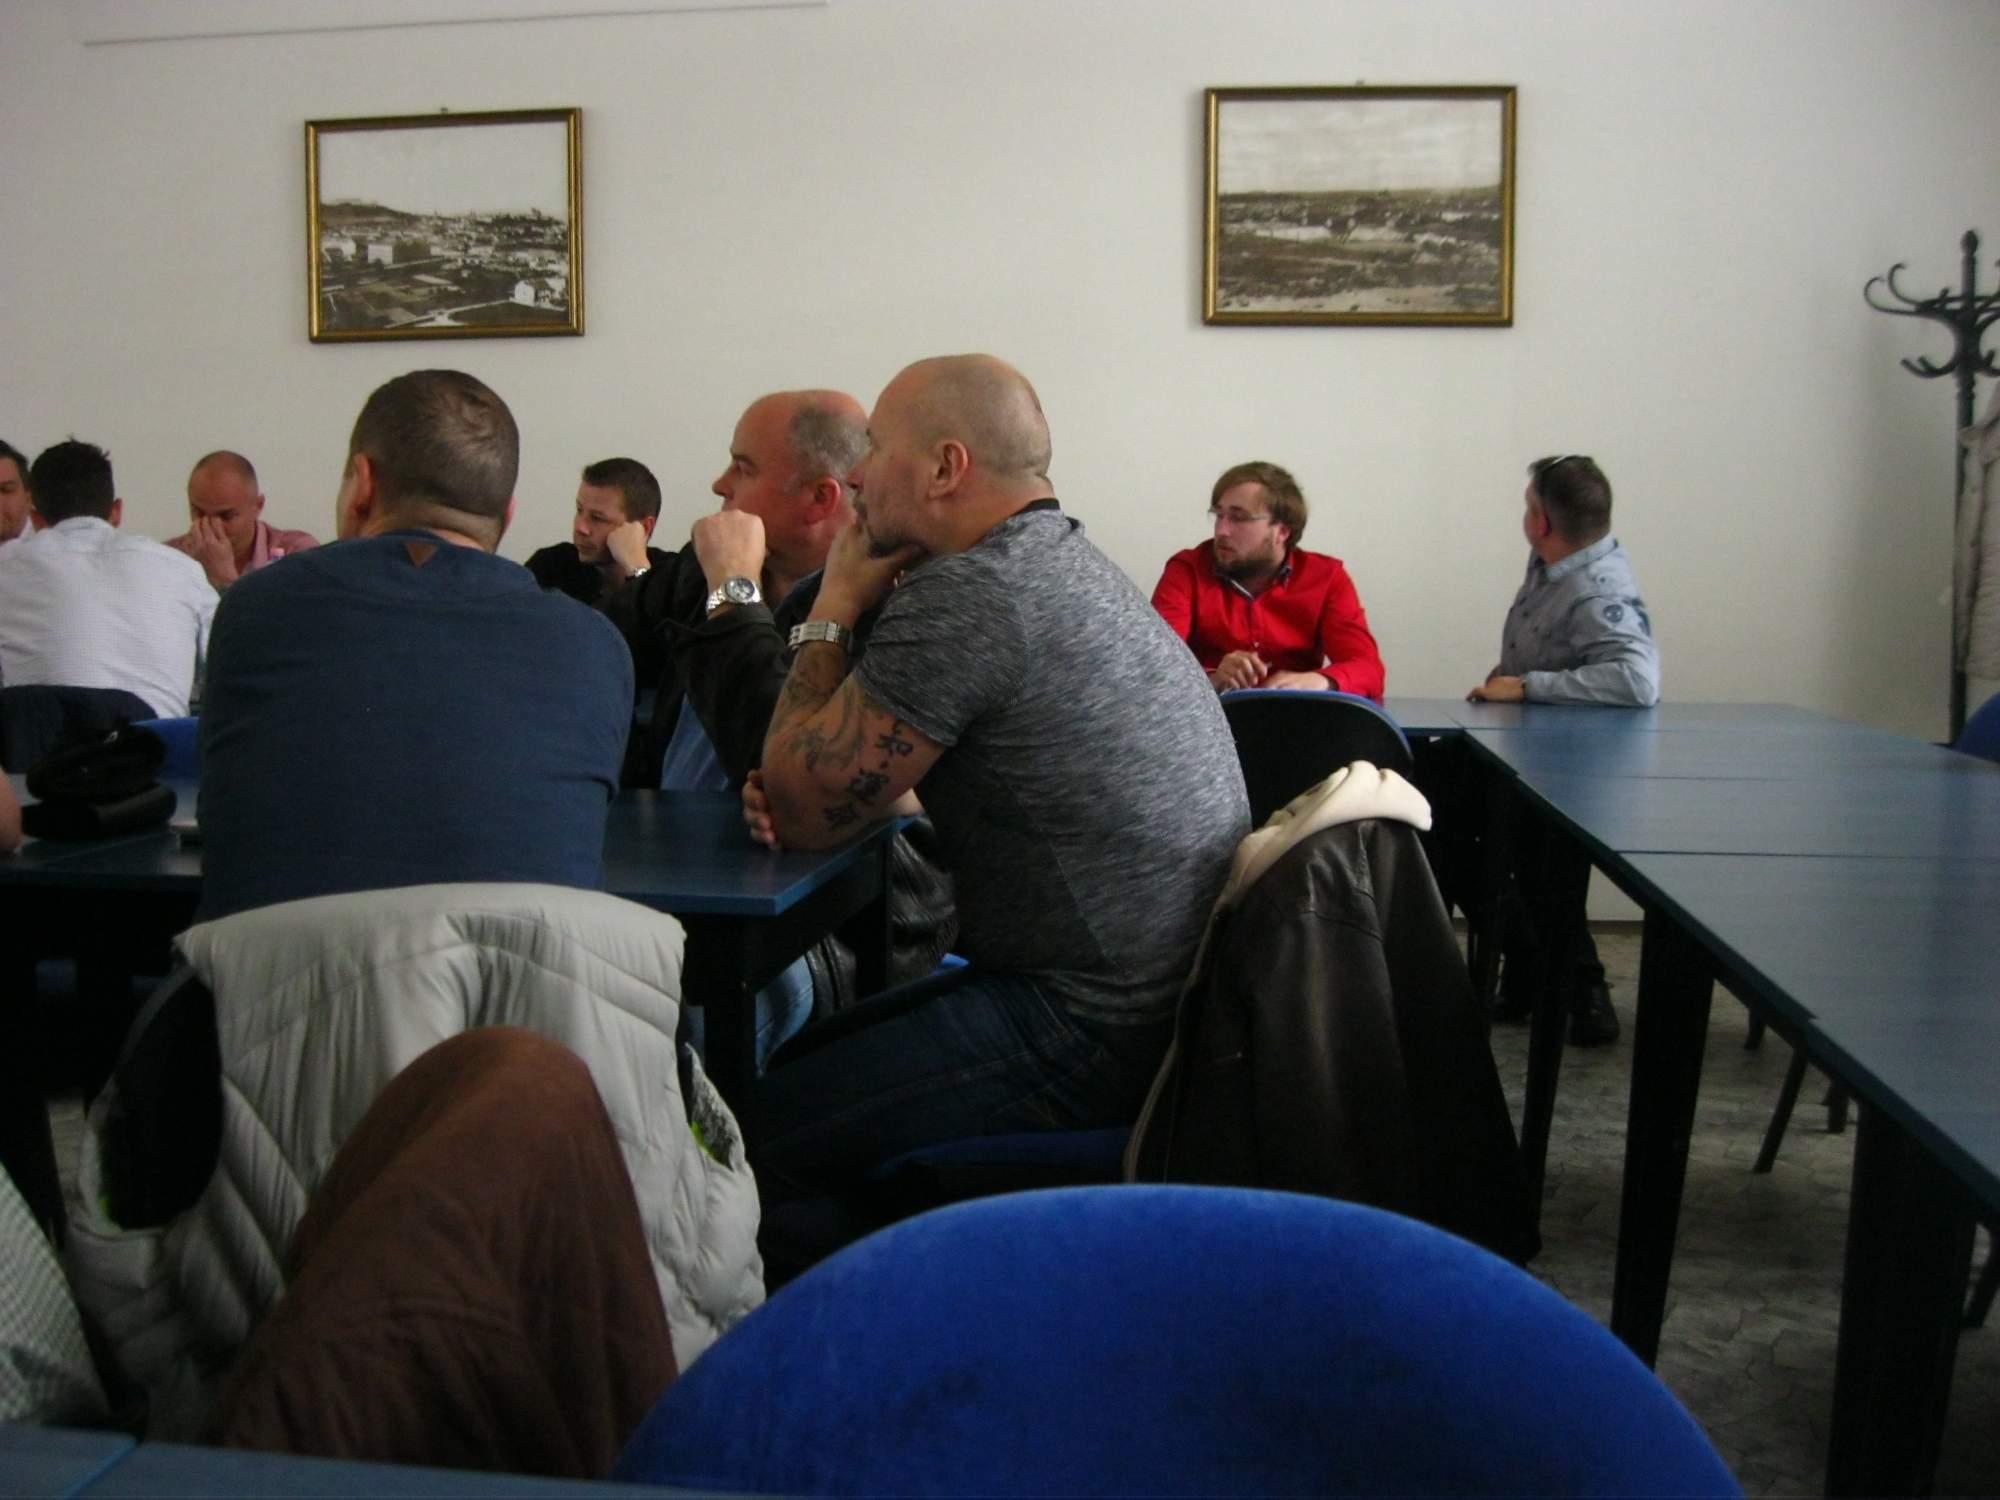 Provozovatelé taxislužeb debatovali na radnici. Foto: Eliška Srncová